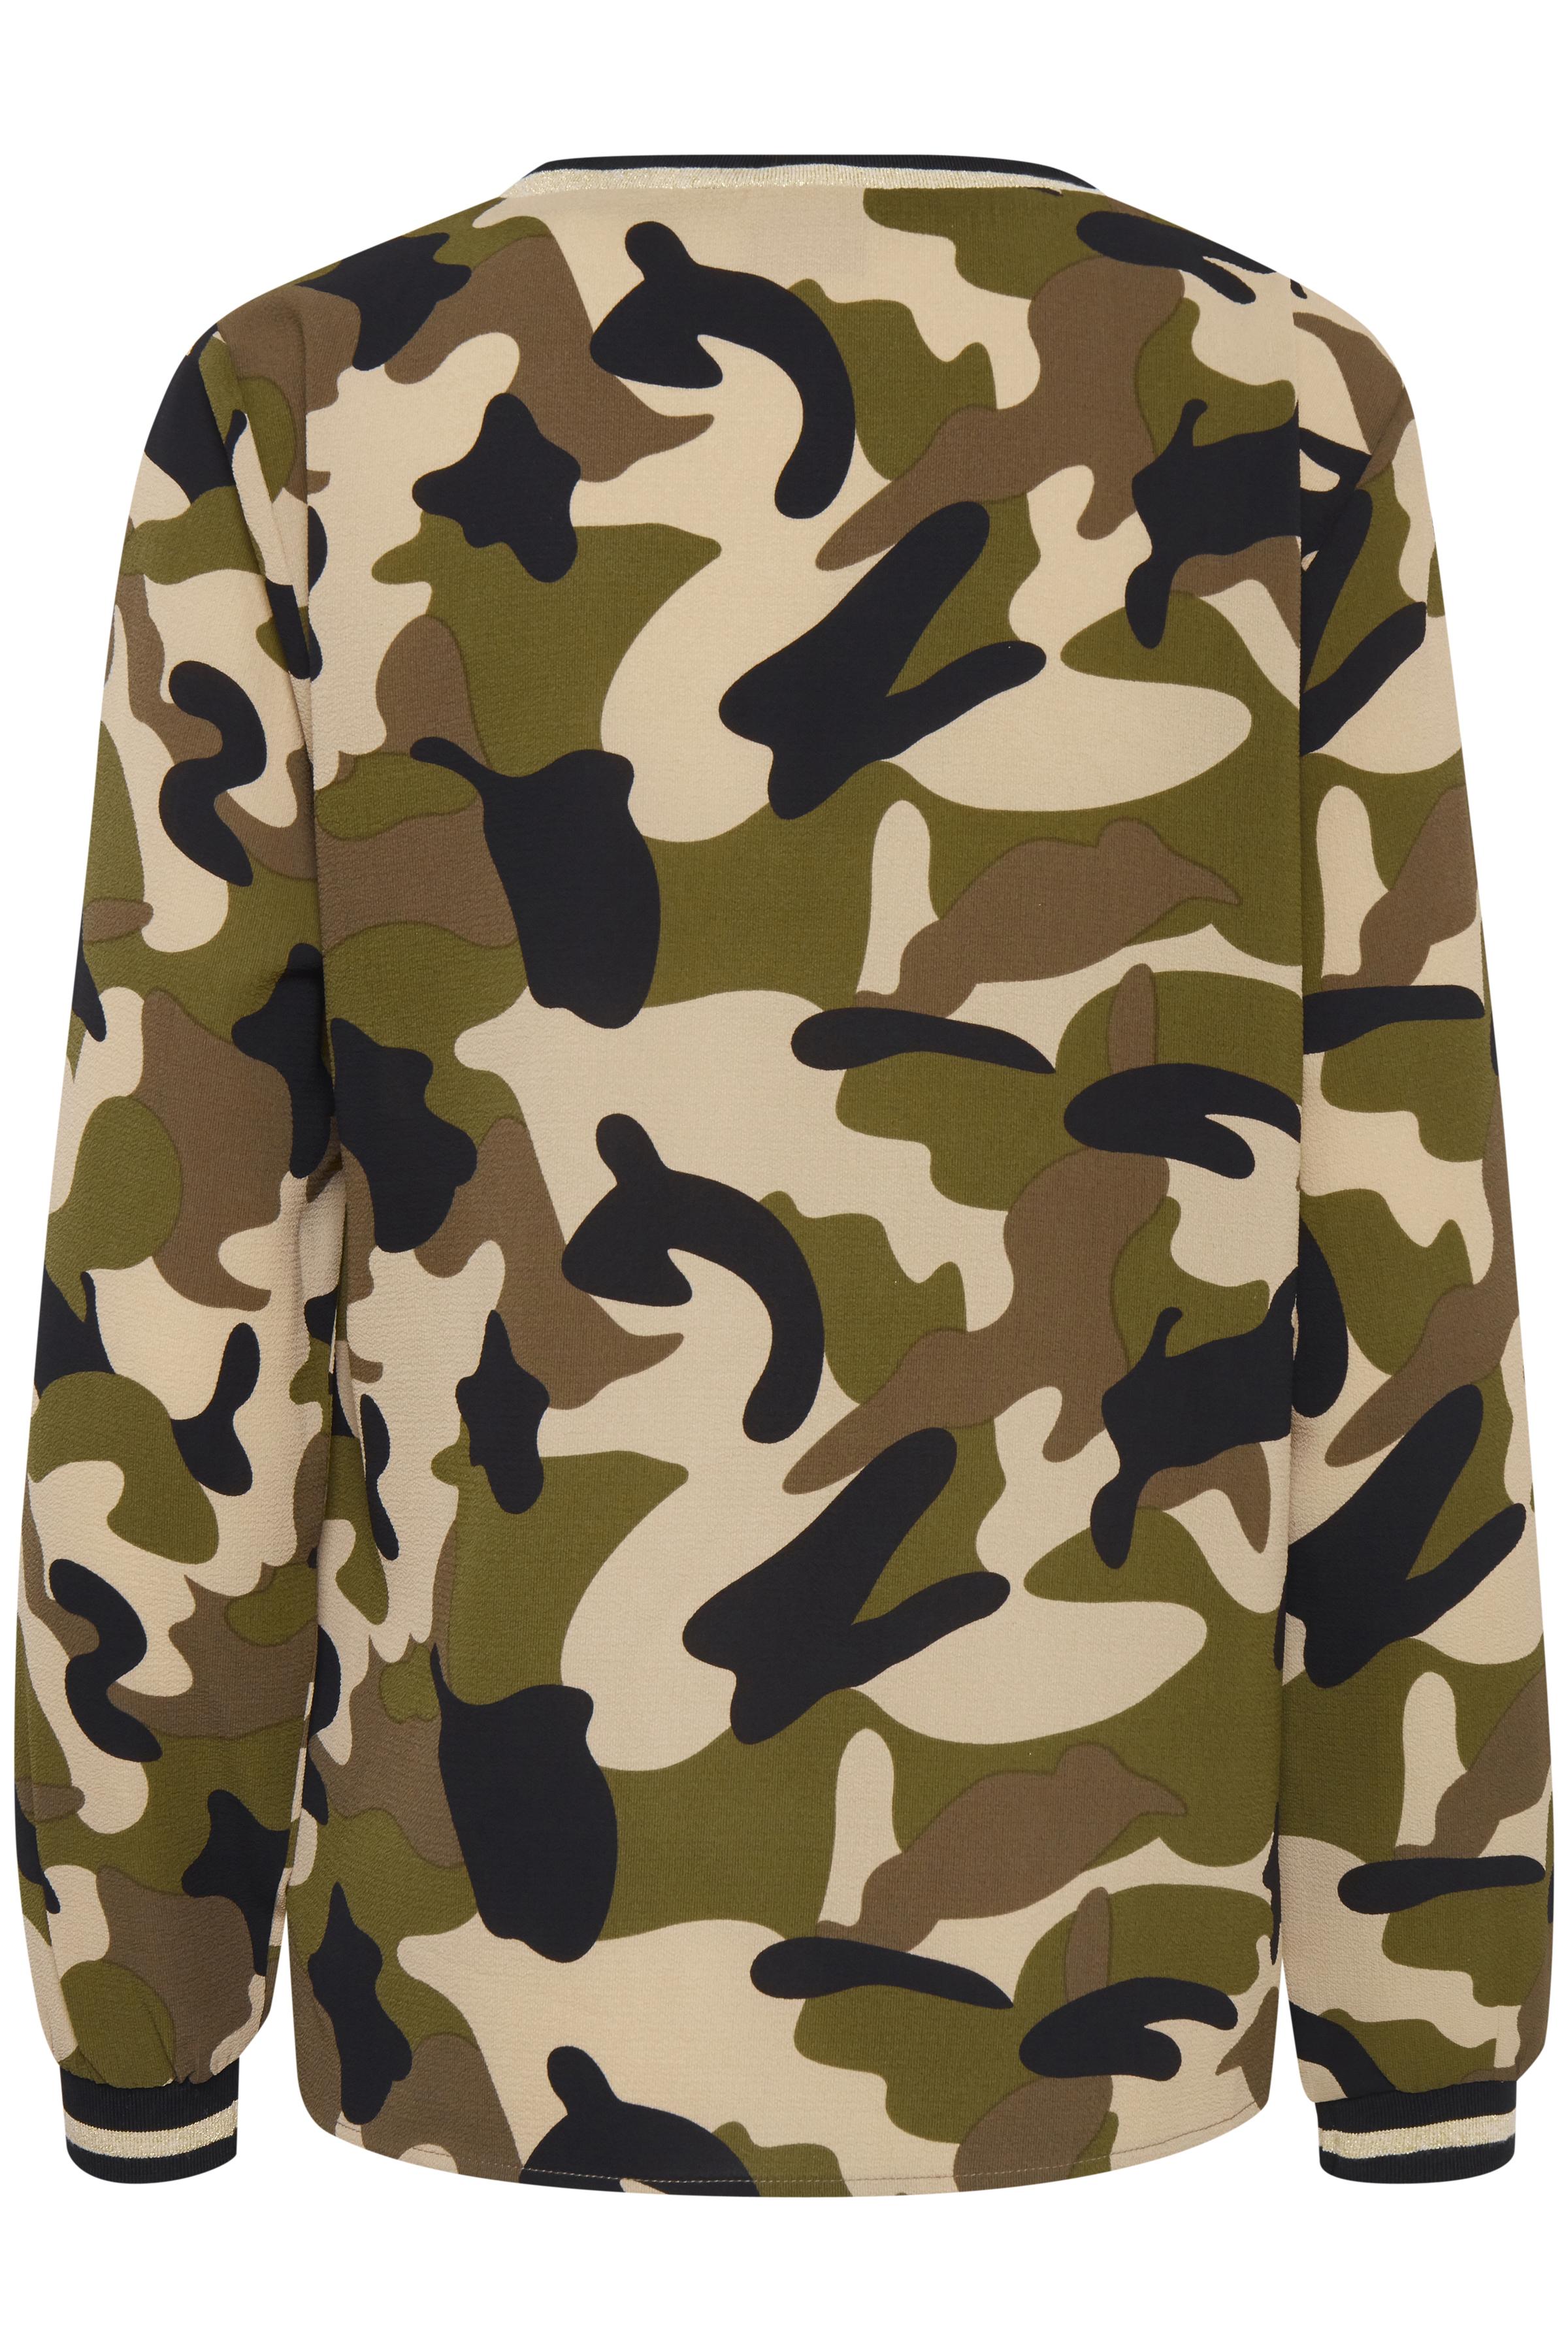 Camo combi 1 Langarm-Bluse von b.young – Kaufen Sie Camo combi 1 Langarm-Bluse aus Größe 36-44 hier